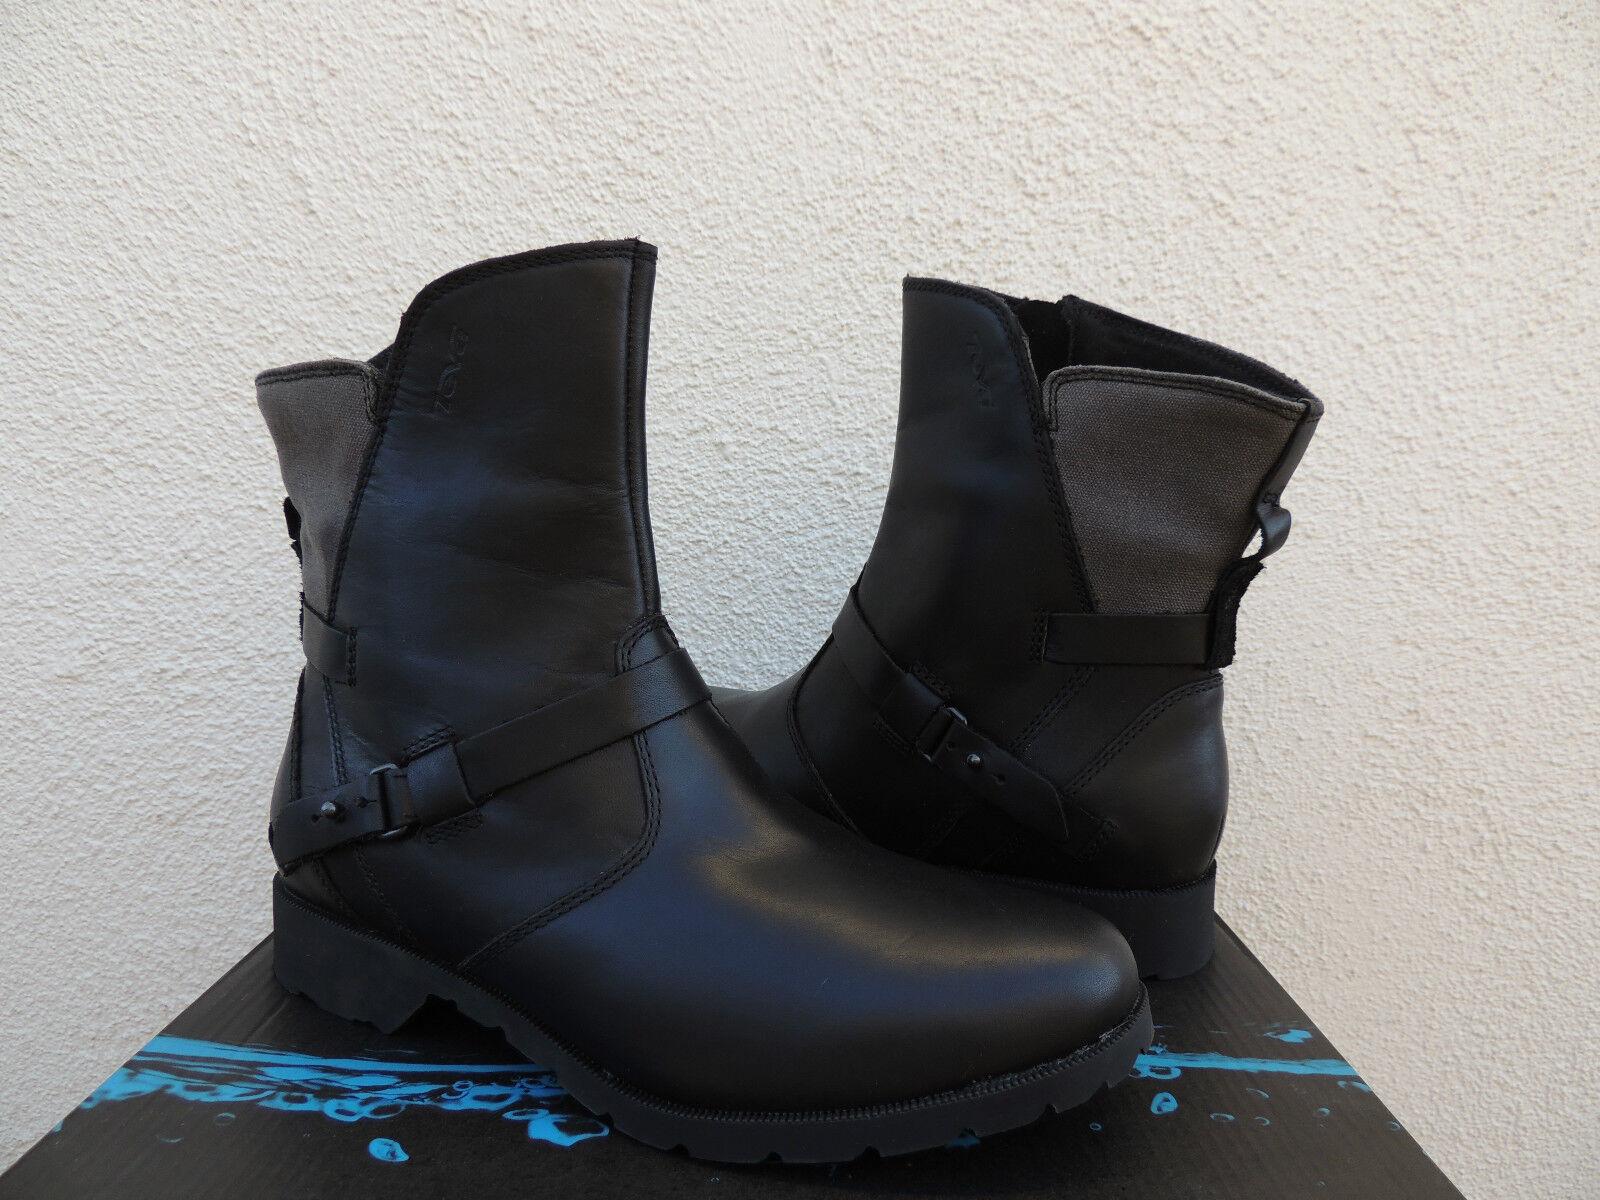 TEVA DE LA LA DE VINA BLACK/ GRAY WATERPROOF LEATHER ANKLE Stiefel, US 5.5/  36.5  NIB 2a2f29